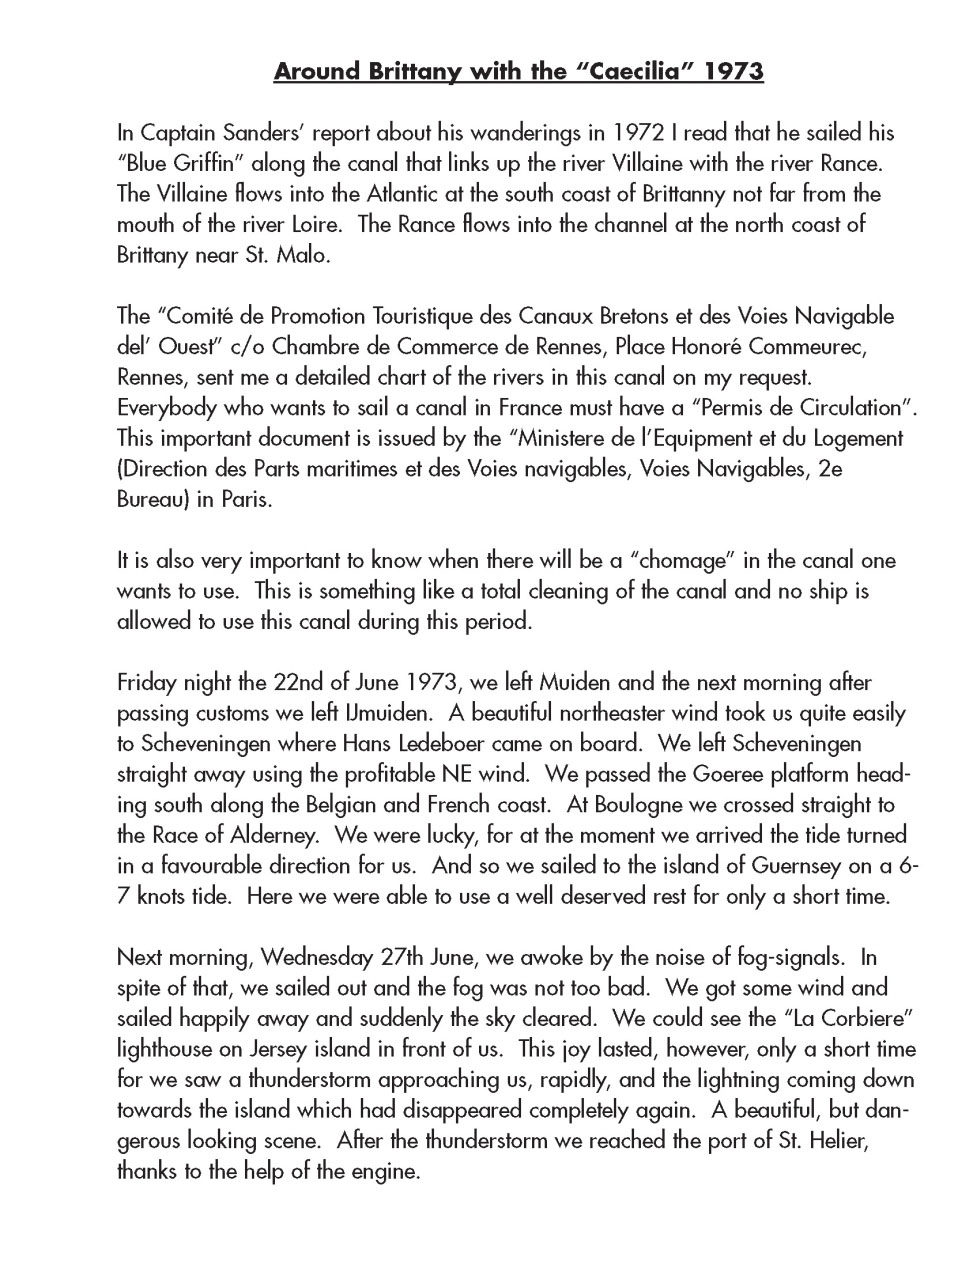 Narrative1973_Page_1